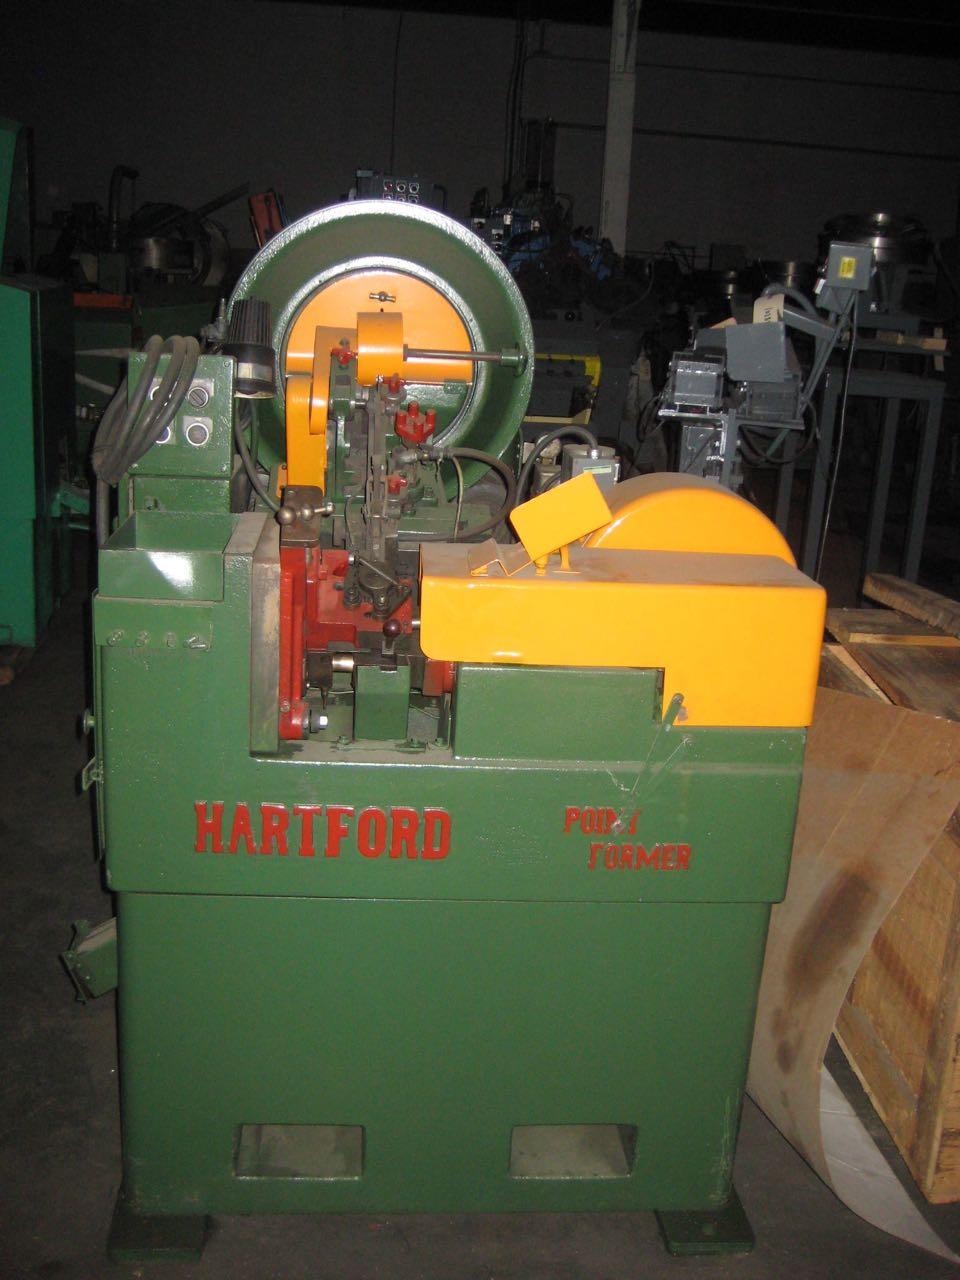 "5/16"" Hartford Model 5-700 Pinch Pointer"